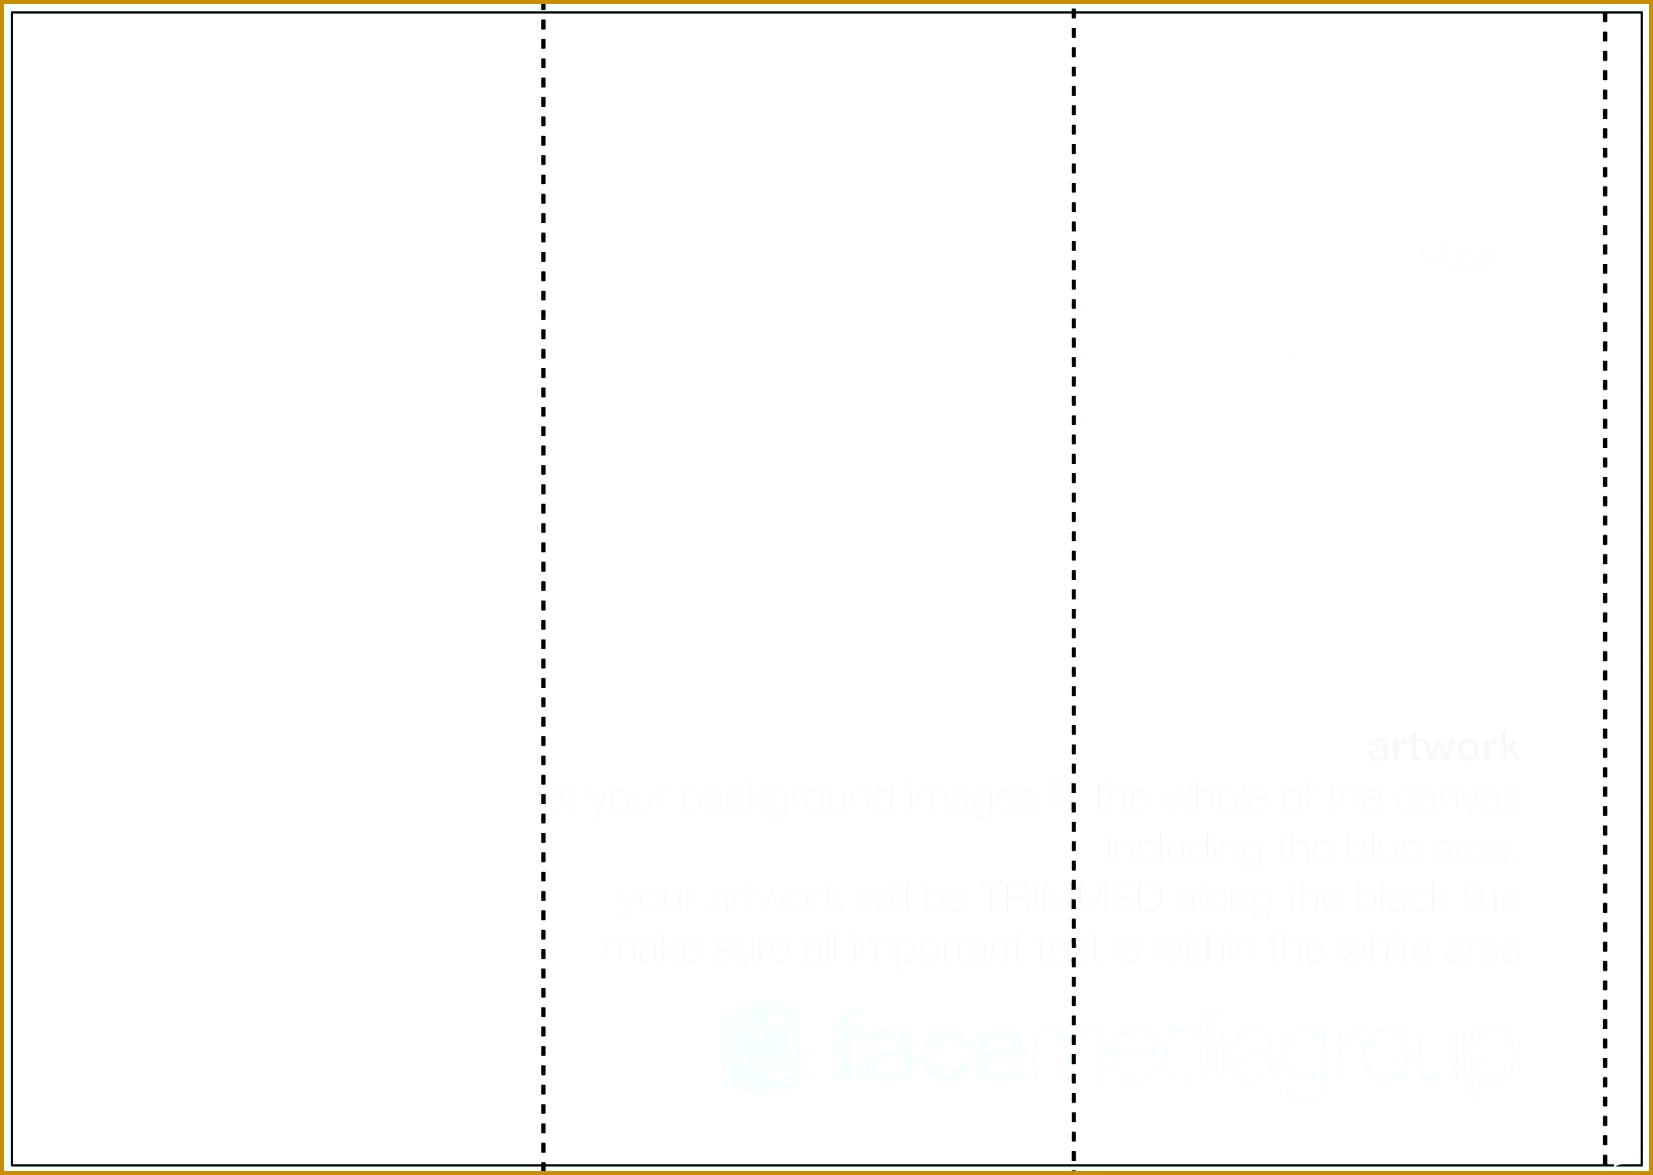 11—17 Brochure Template Word Free Elegant Brochure Template Printable Insssrenterprisesco Free Blank Tri Fold 11751653